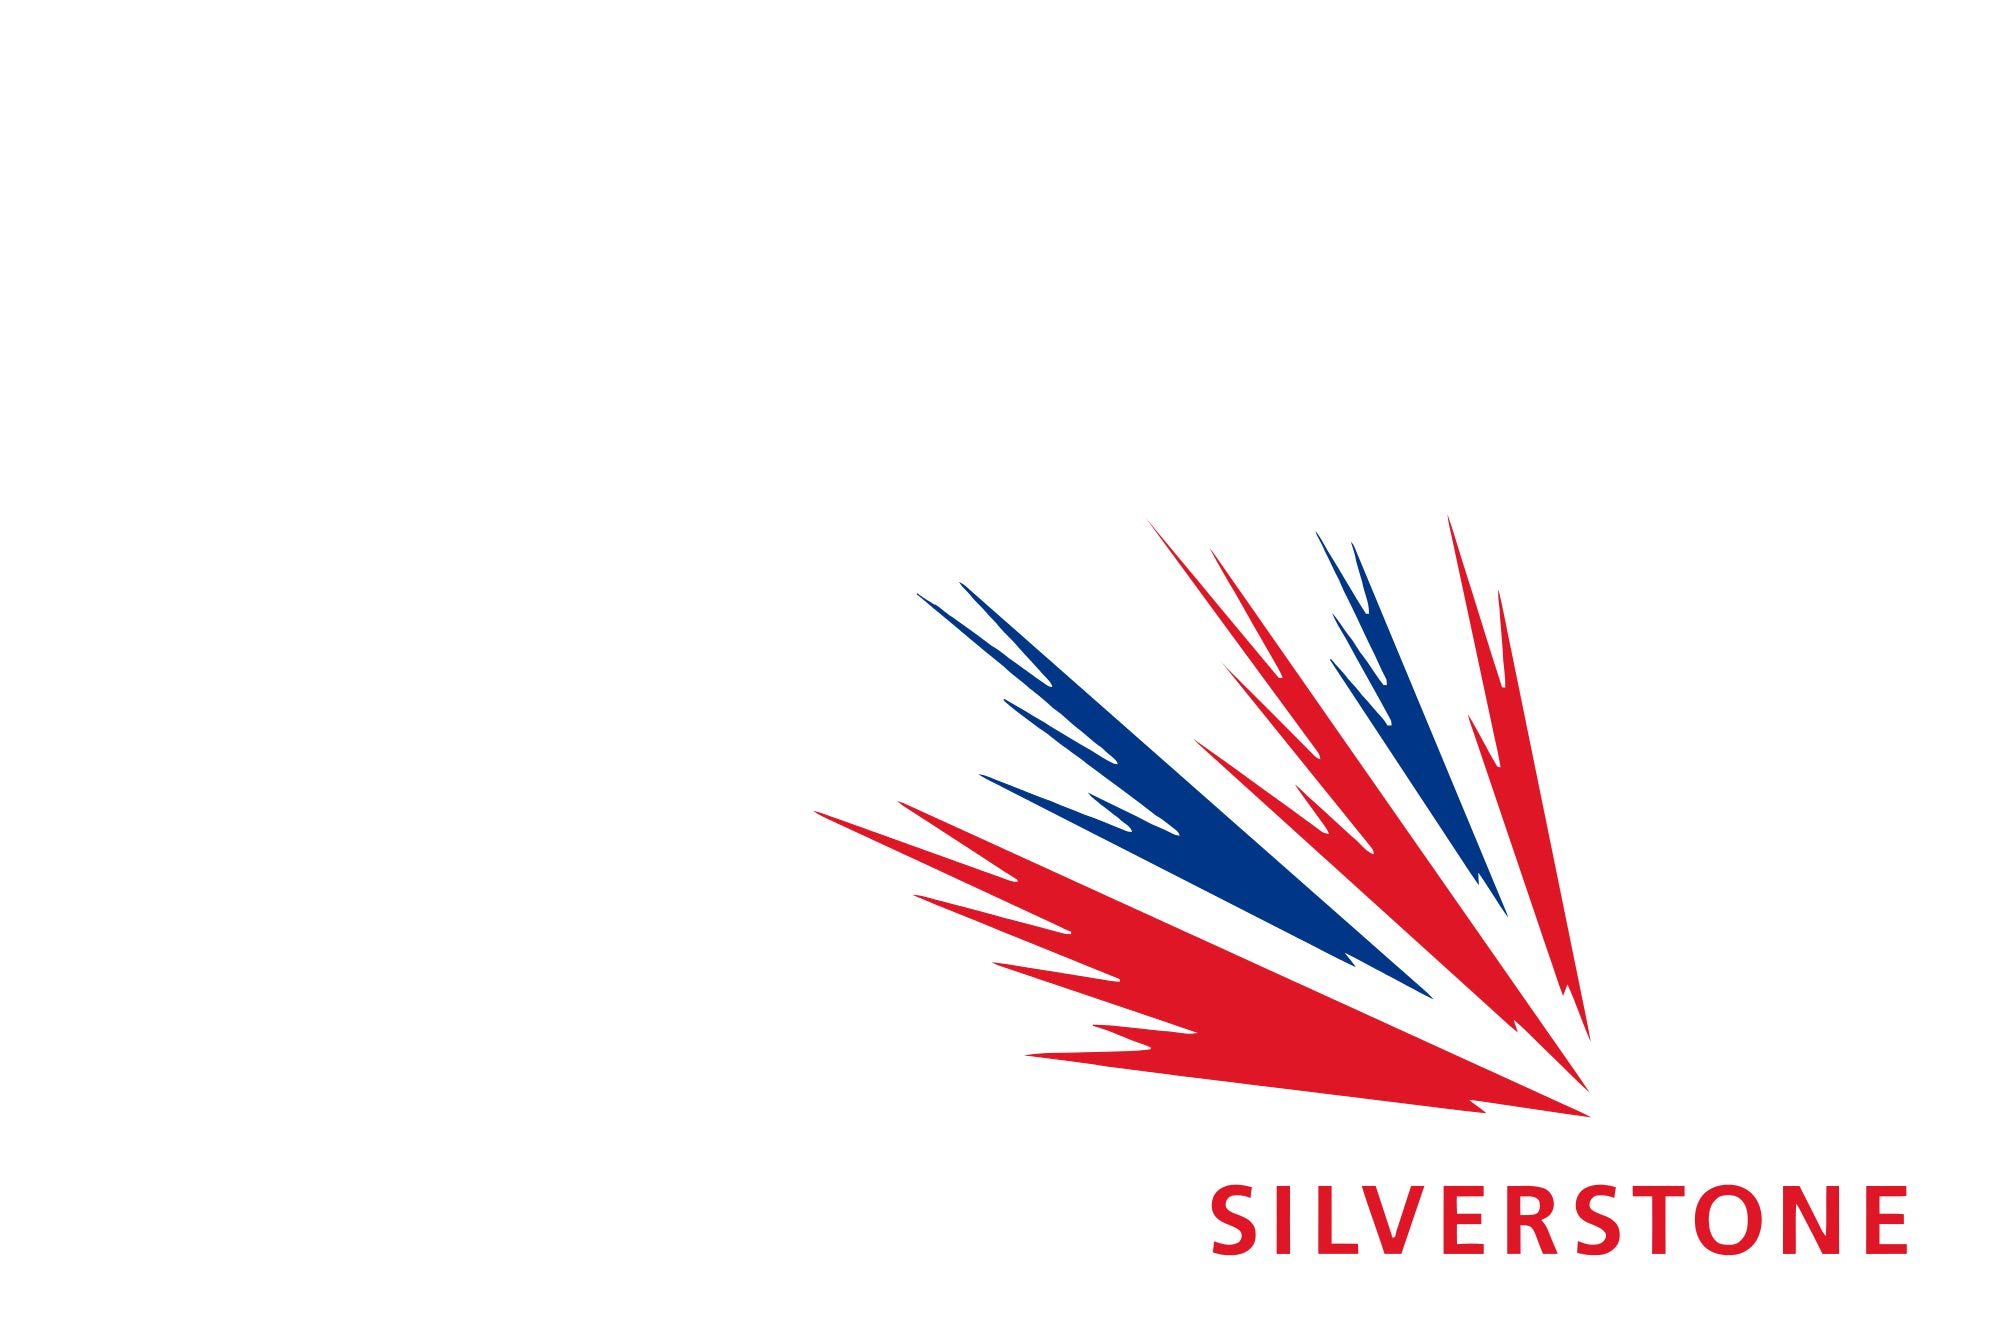 Winner Malaysian Grand Prix 2016 Silverstone Circuit Logo